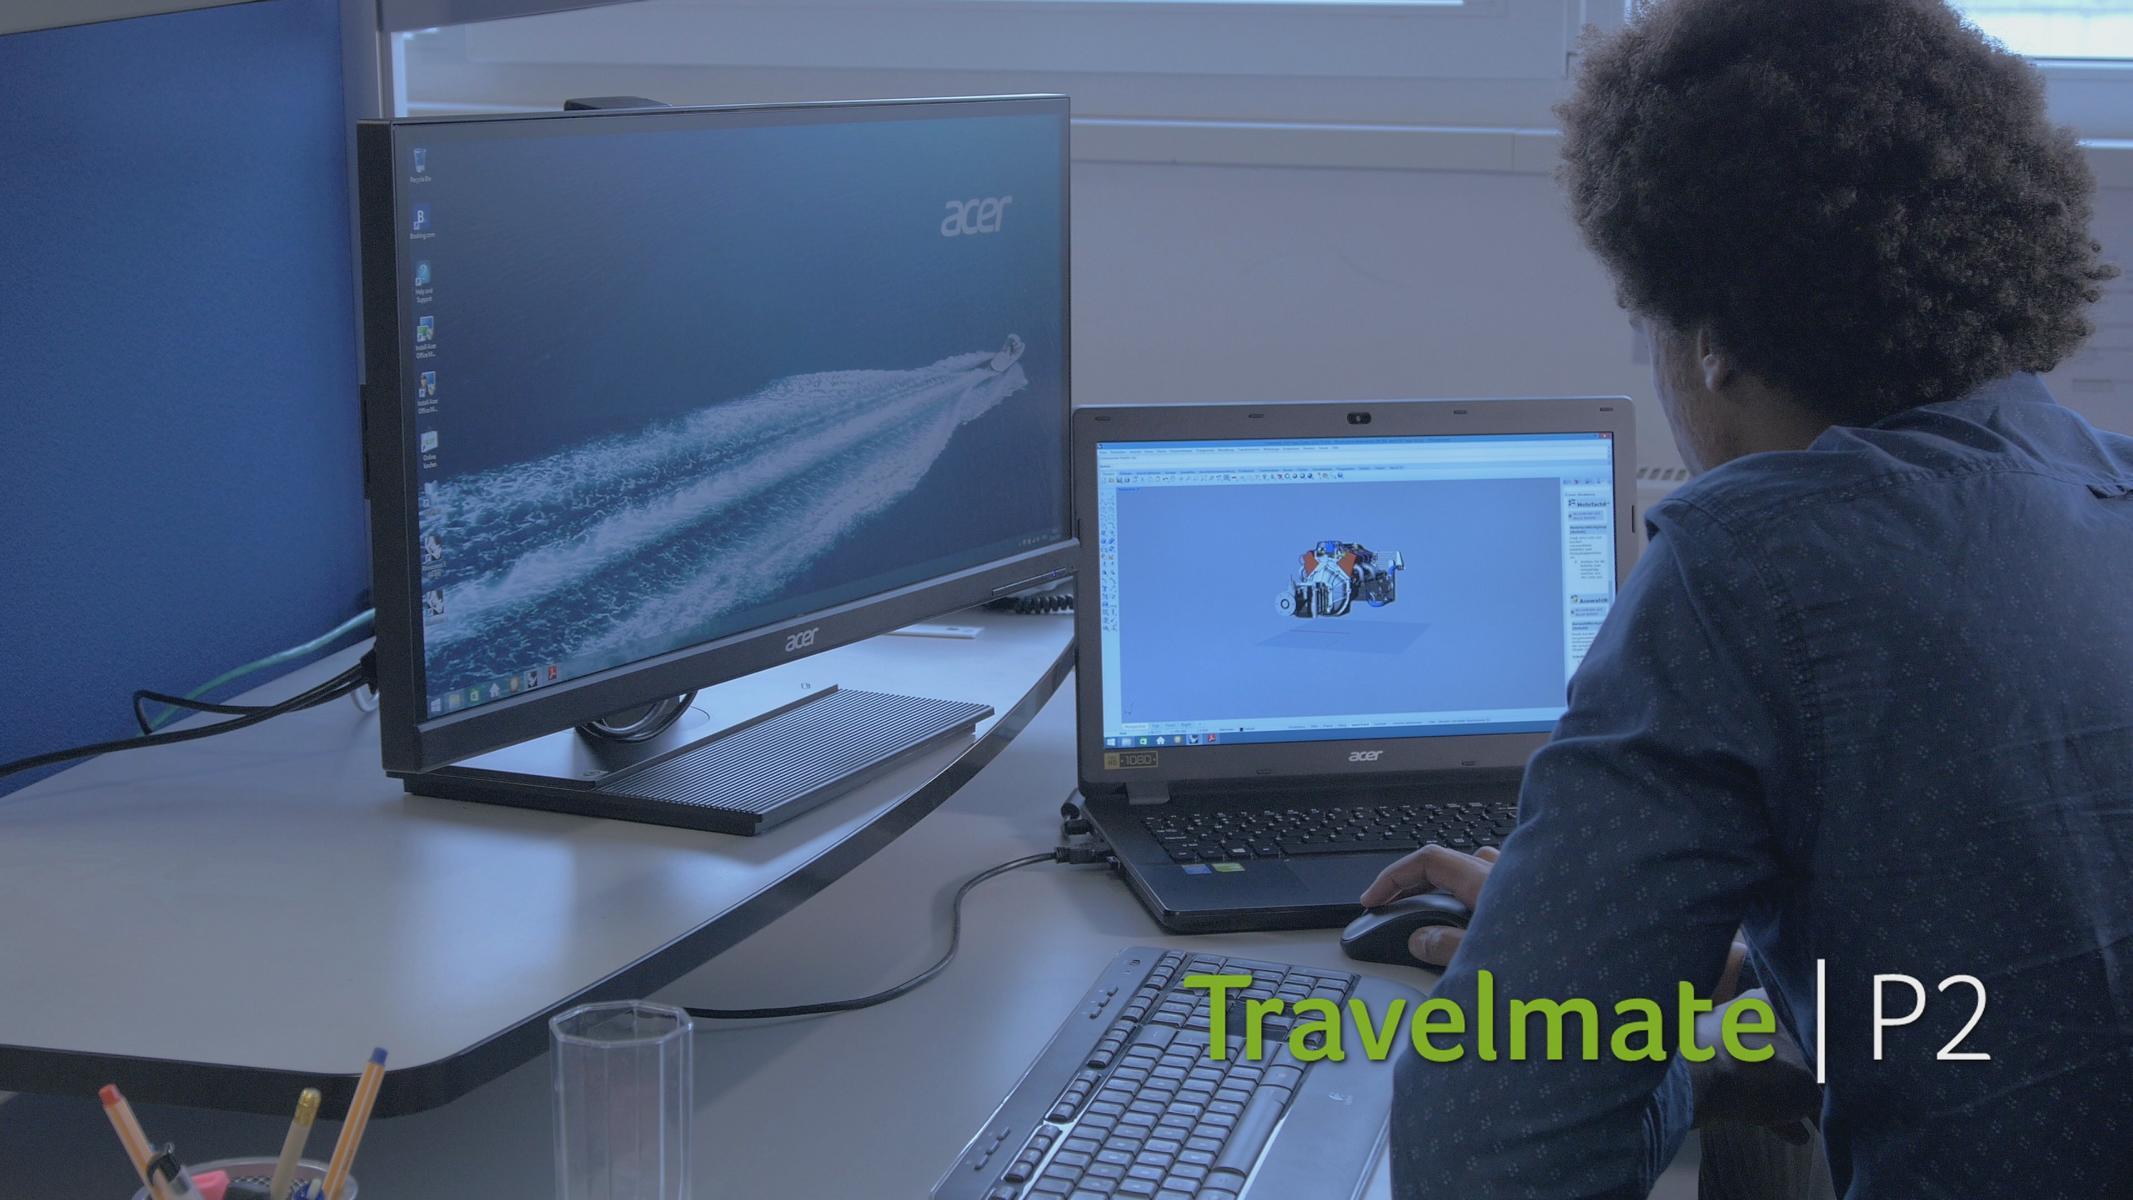 Acer Travelmate P2 Notebooks